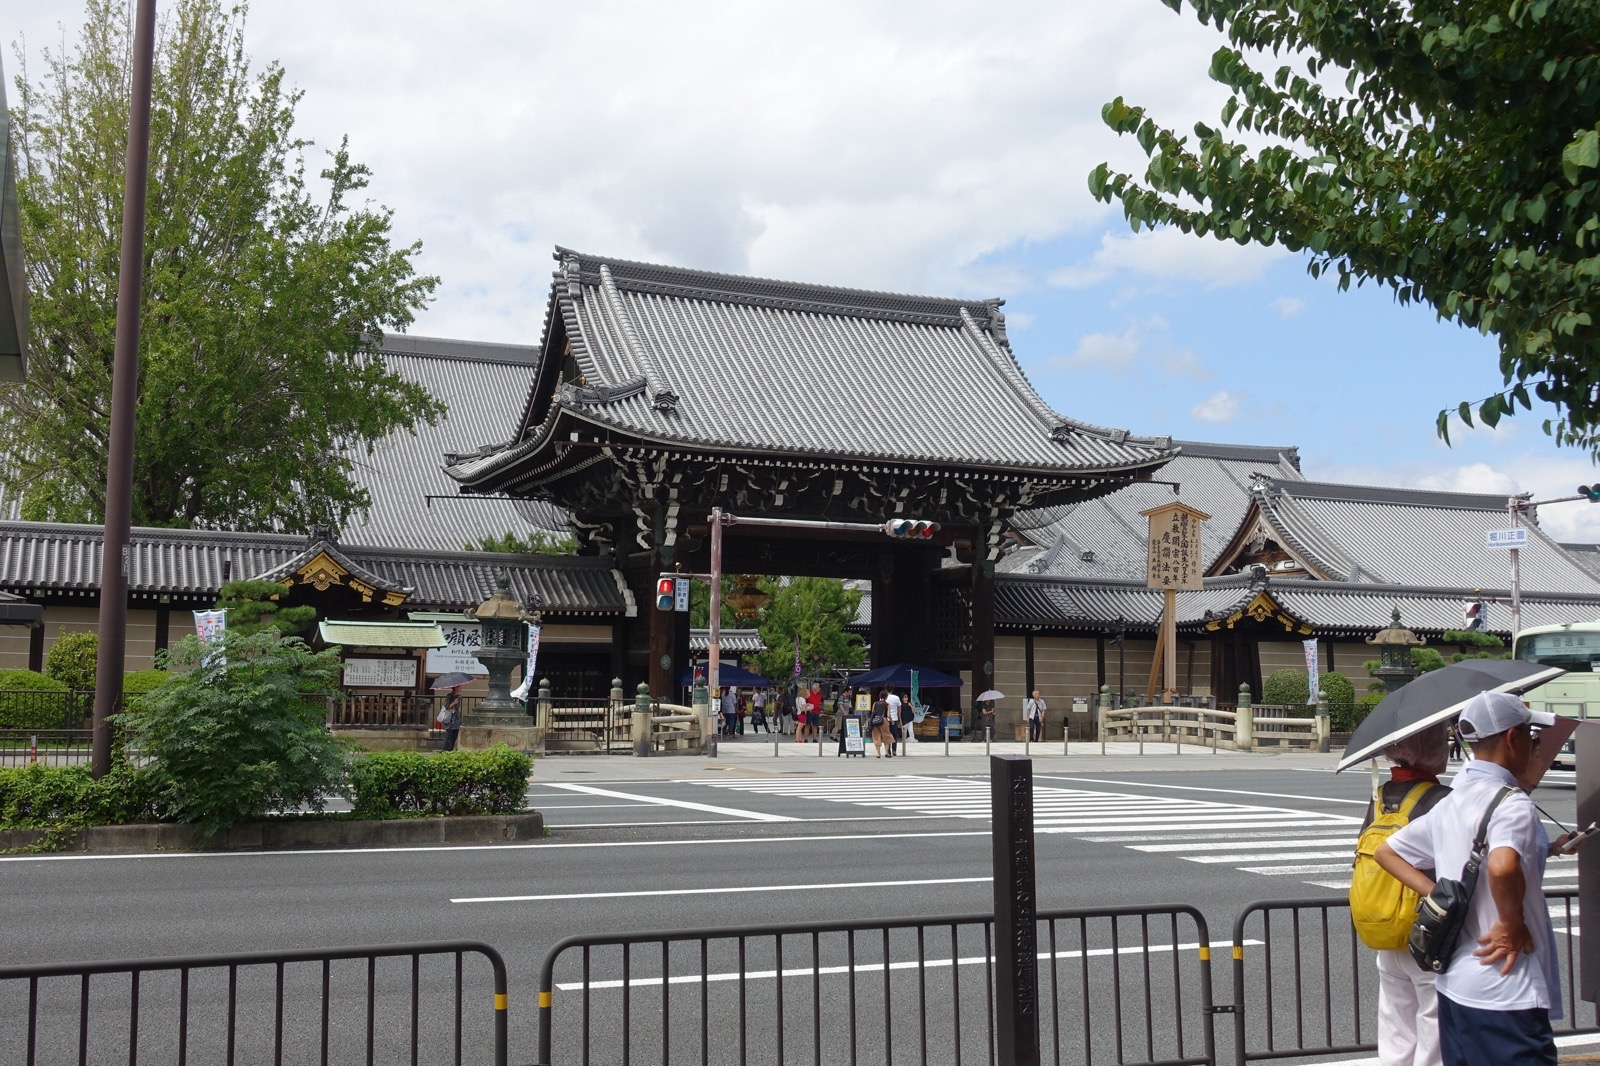 西本願寺 kyoto